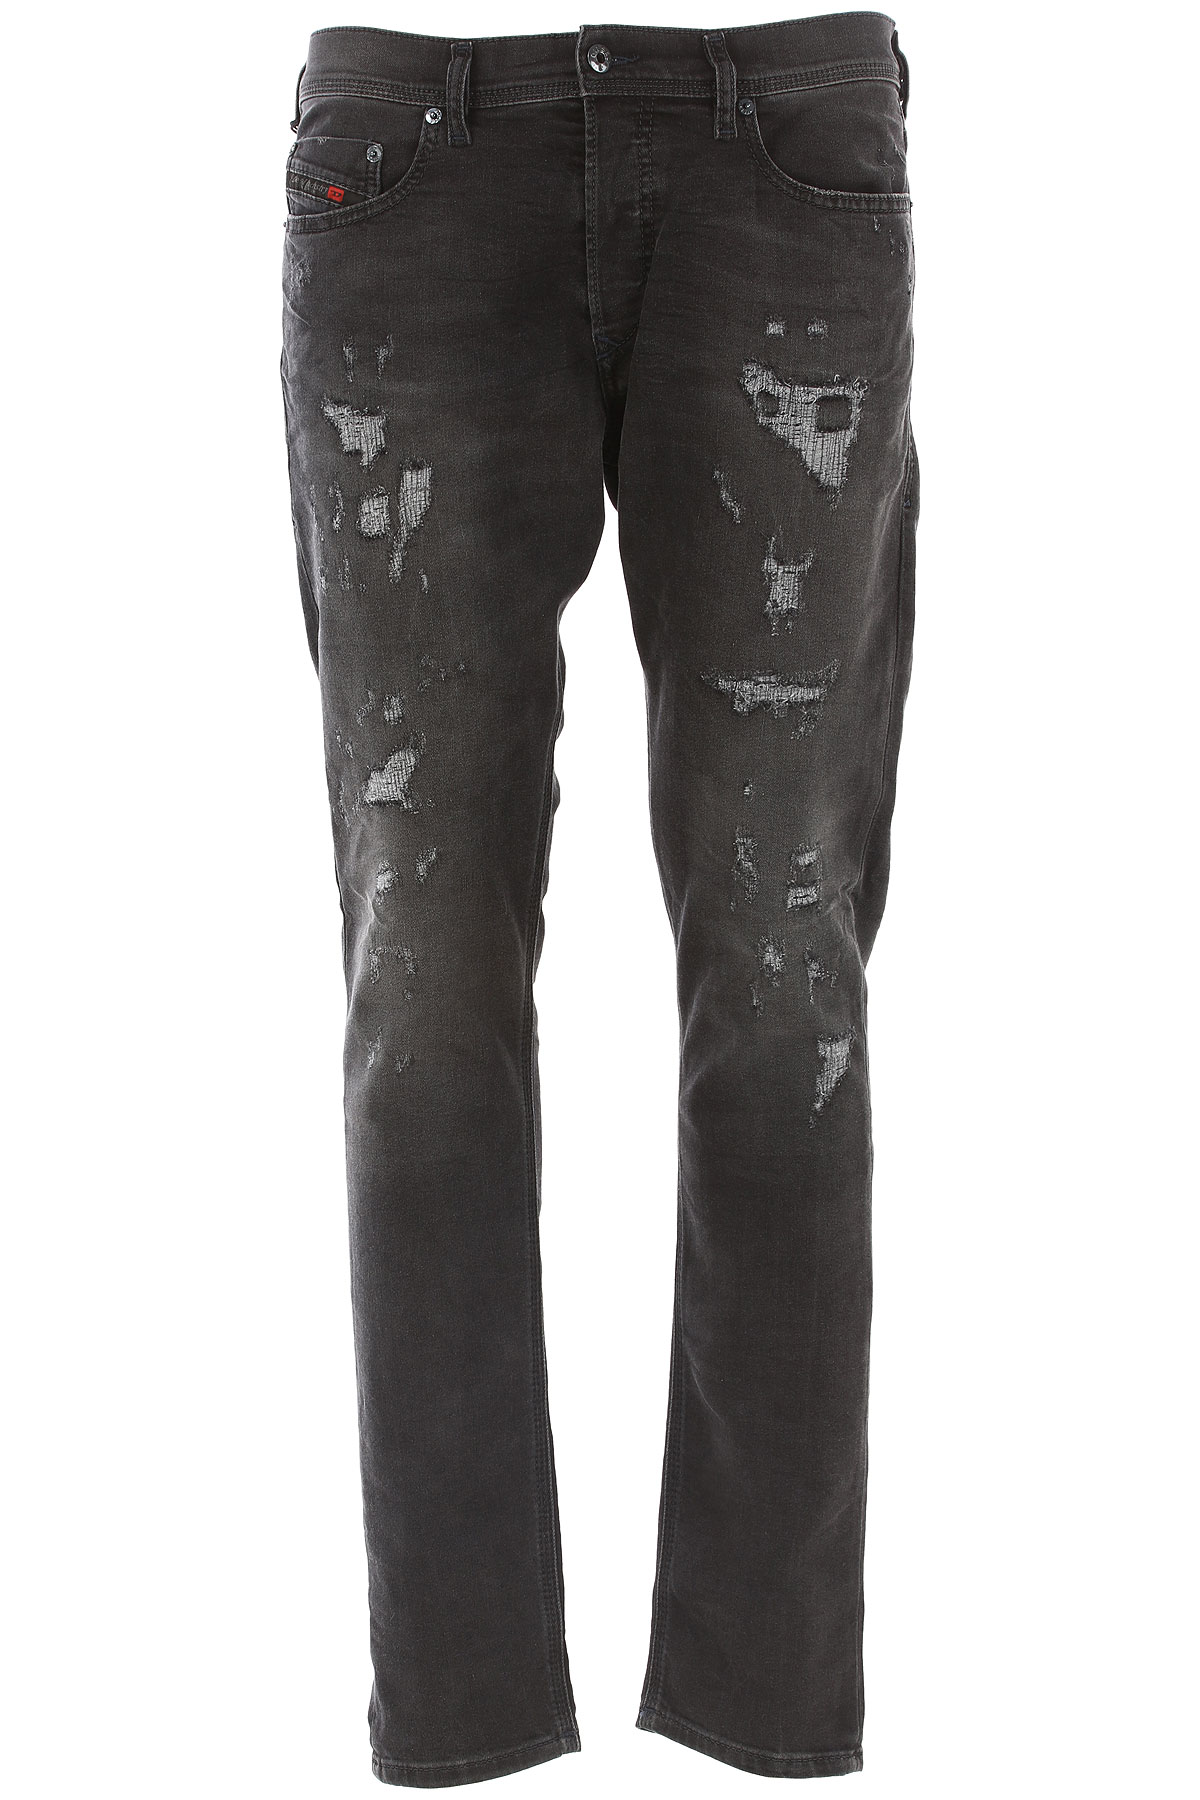 Diesel Jeans On Sale in Outlet, Tepphar, Black, Cotton, 2017, 30 31 32 34 USA-410054